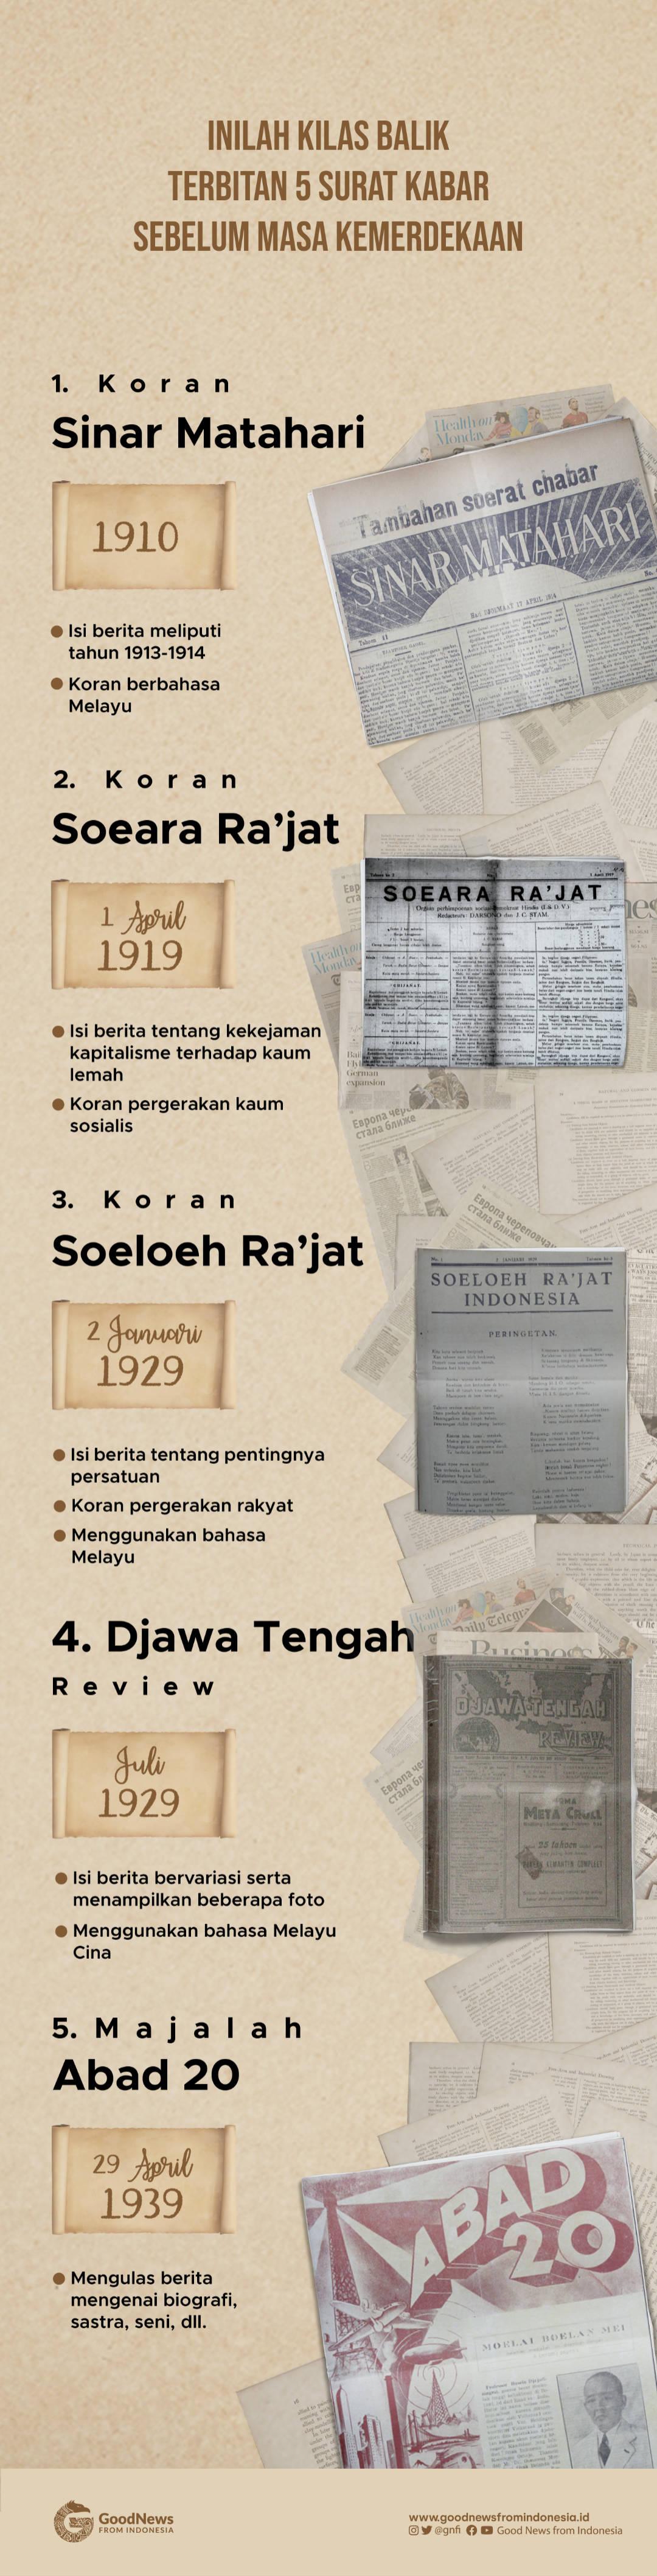 Surat Kabar Tempo Dulu, Menjaga Nilai dan Budaya Indonesia